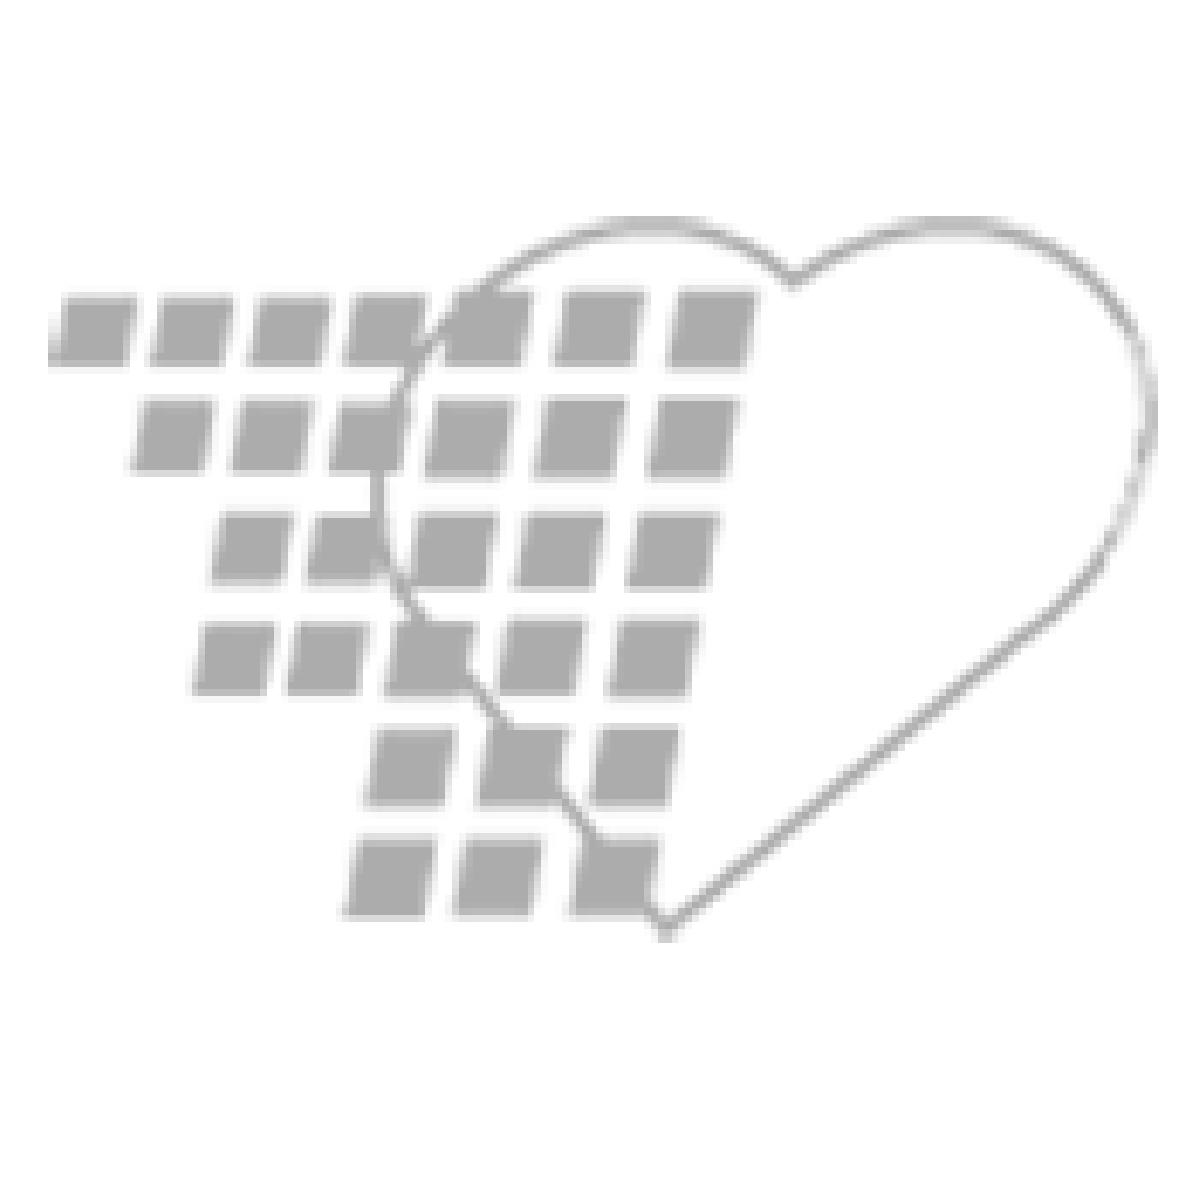 07-71-7245 Argyle™ Specimen Trap - 40 mL